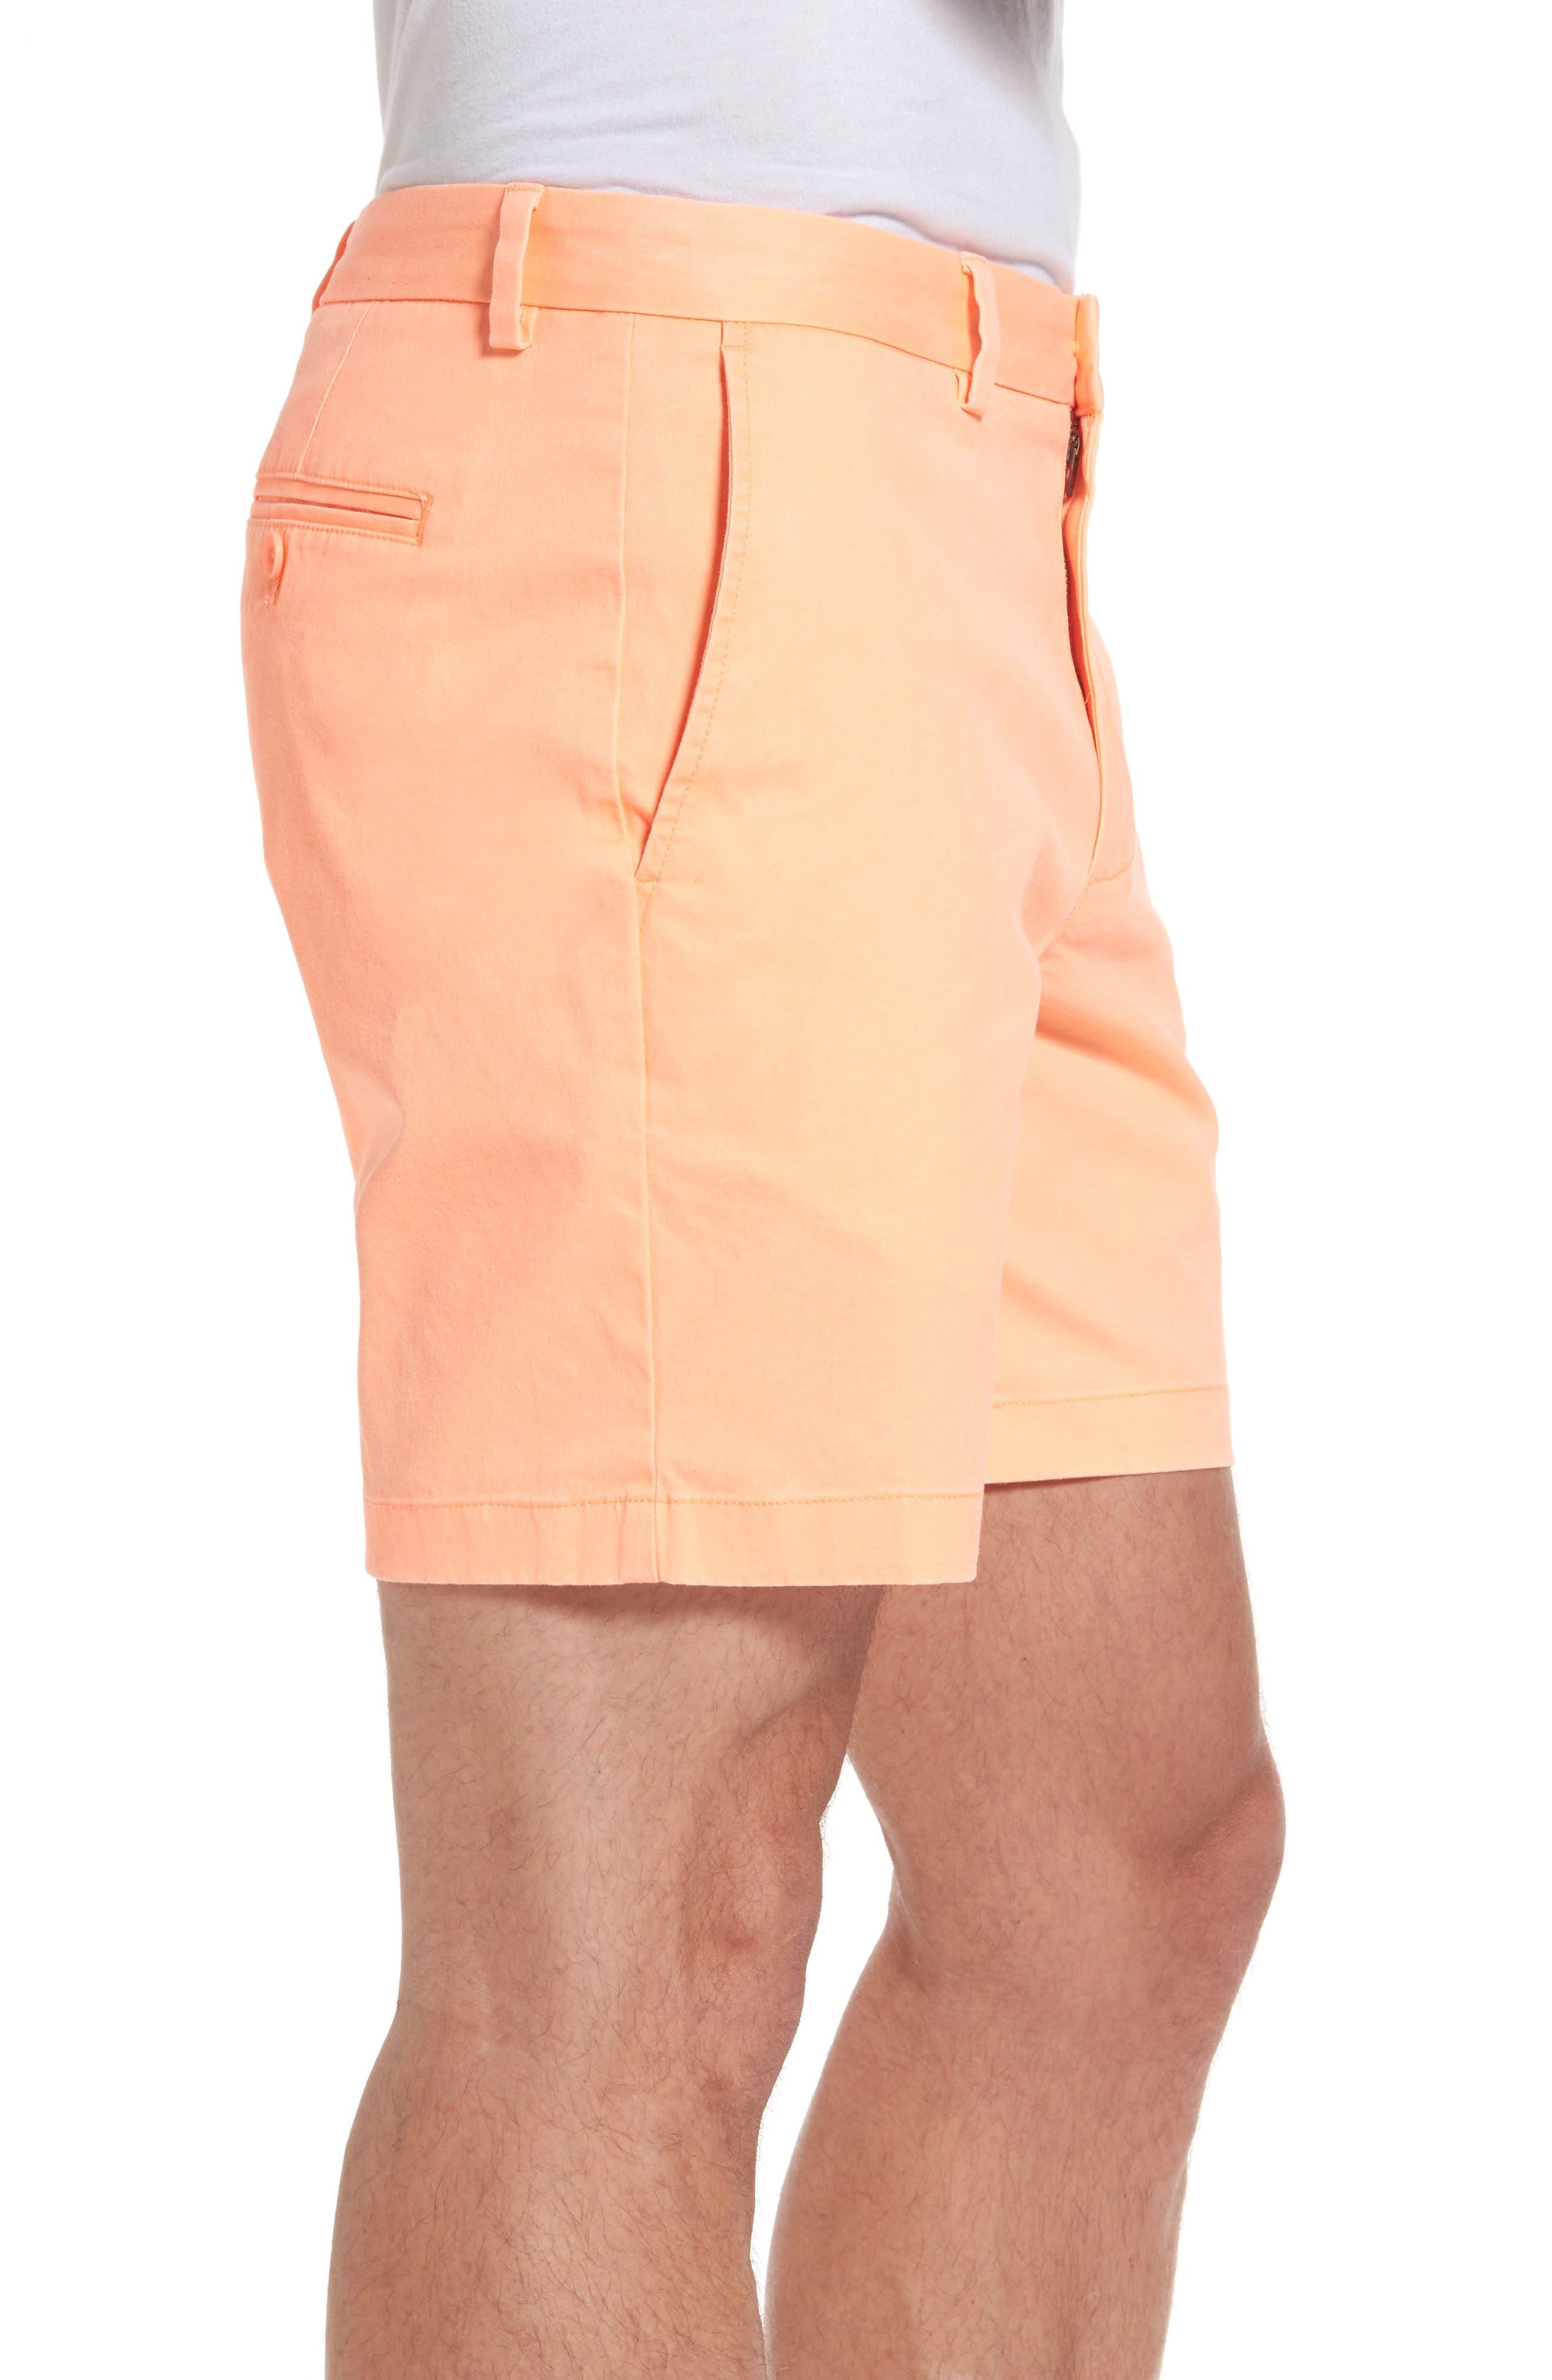 7 Inch Breaker Stretch Shorts,                             Alternate thumbnail 3, color,                             885